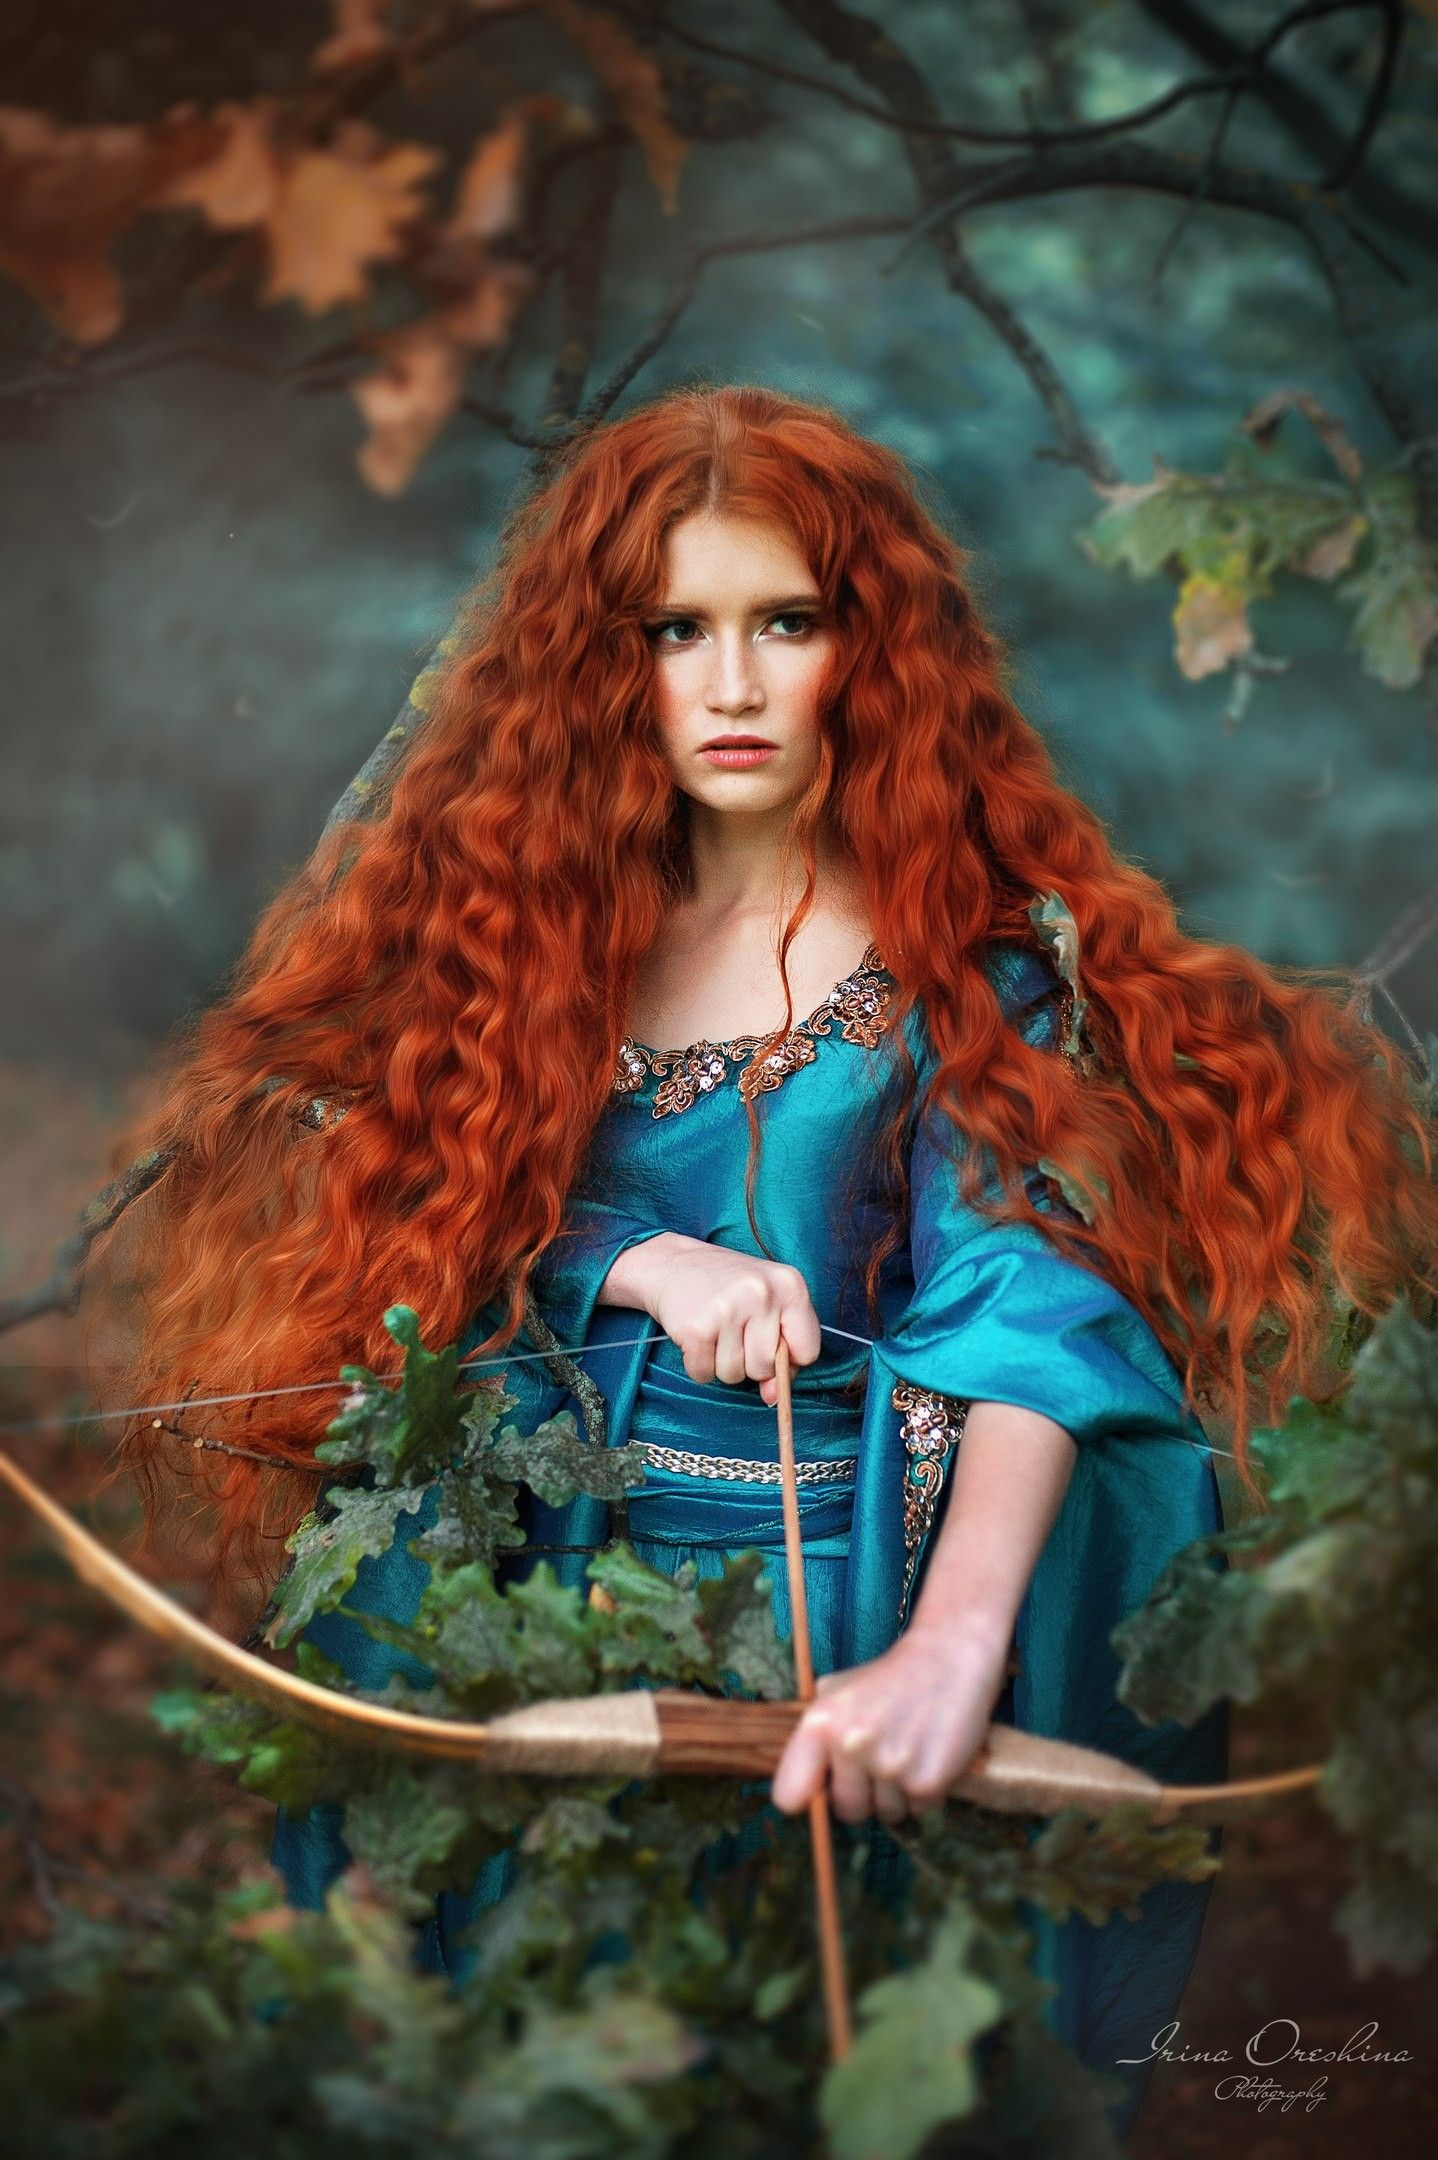 Pin by kaśka długozima on reference photos pinterest witches